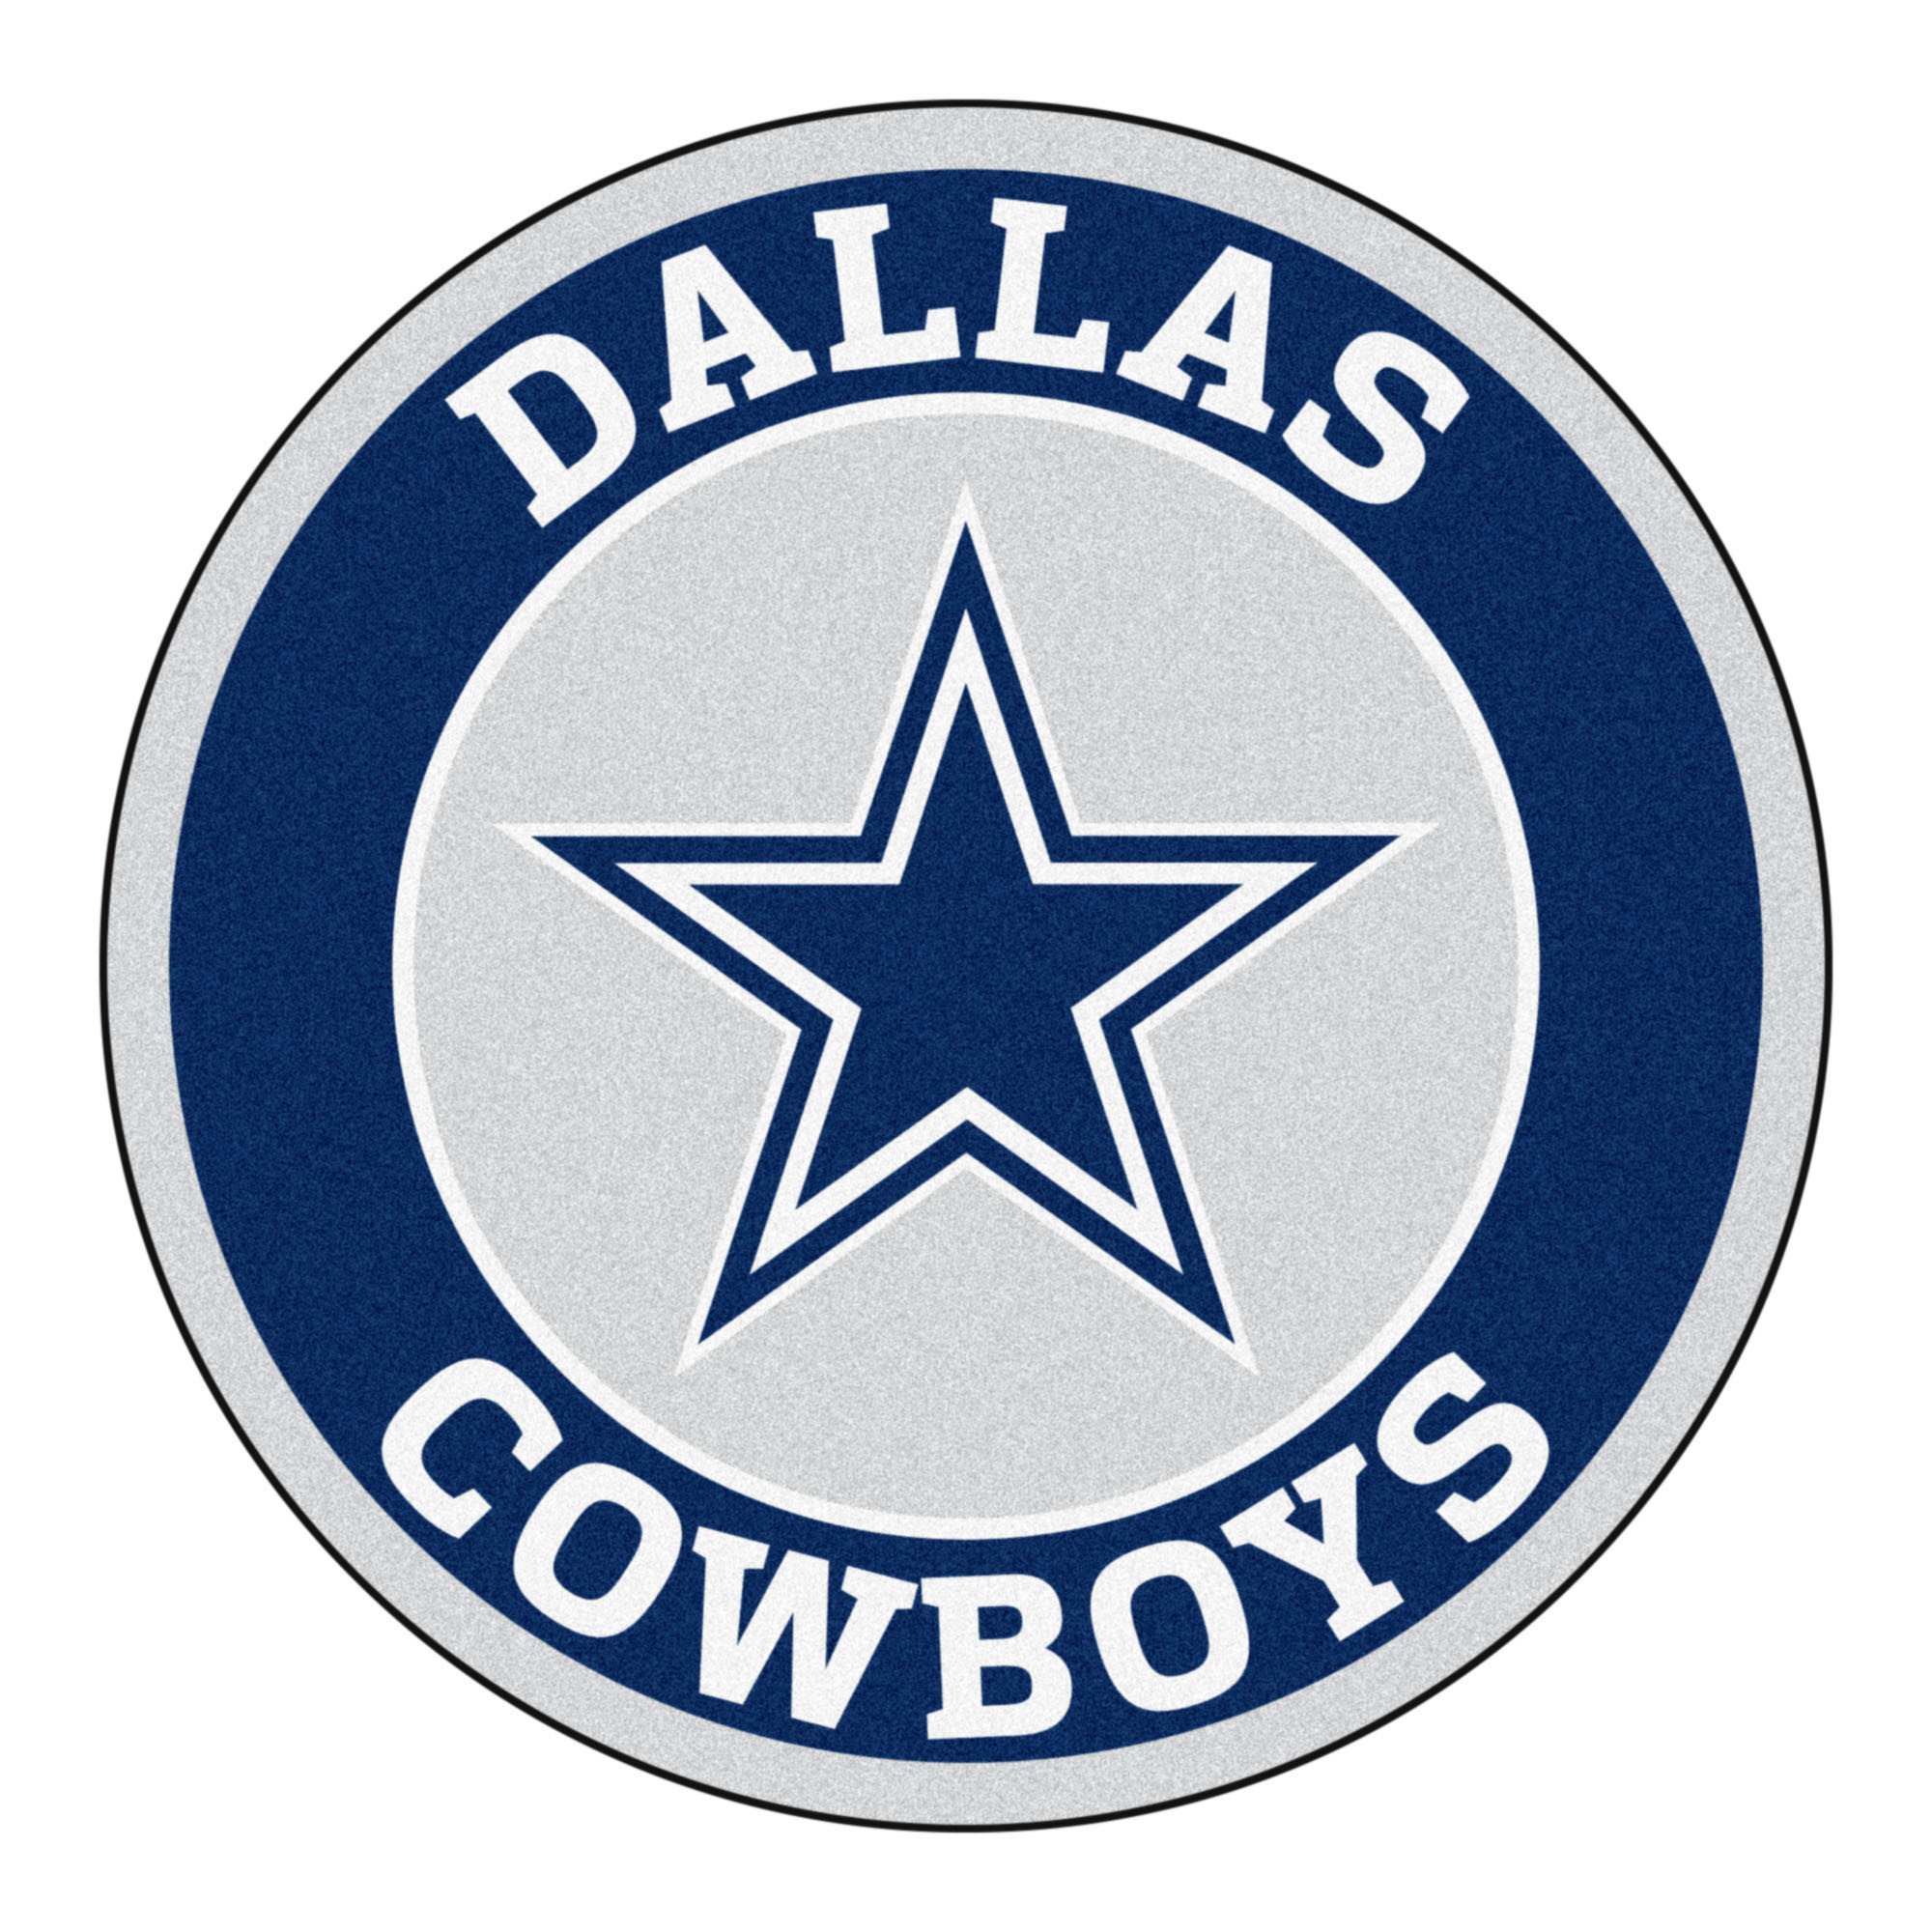 Dallas Cowboys Wallpaper Free: Dallas Cowboys Computer Wallpaper (57+ Images